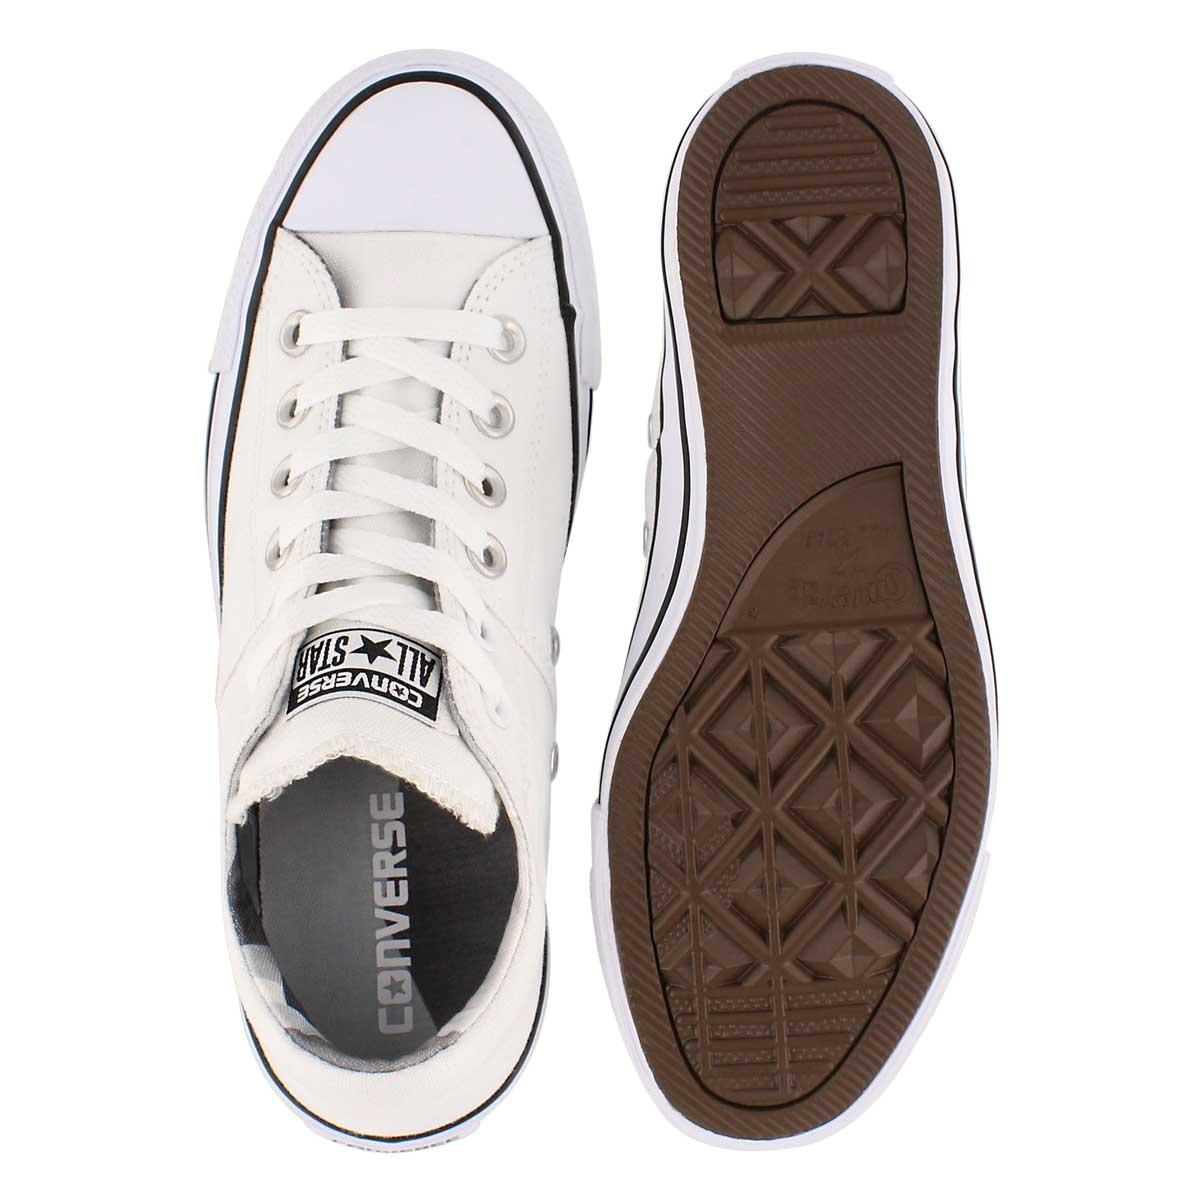 Lds CT A/S Madison Geometric wht sneaker